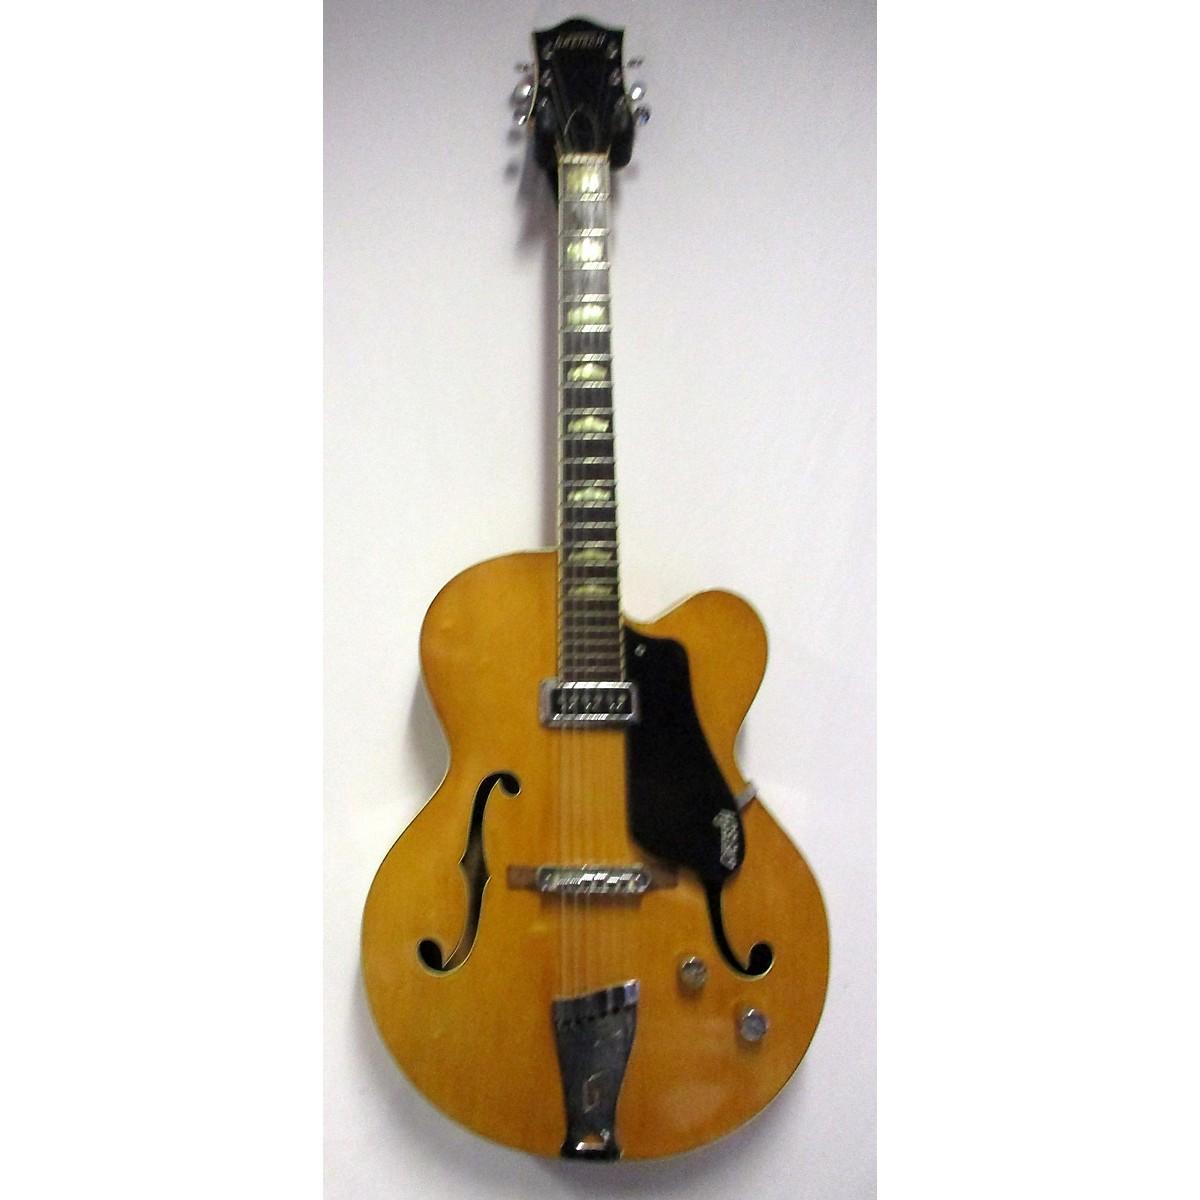 Gretsch Guitars 1957 6191 STREAMLINER Hollow Body Electric Guitar